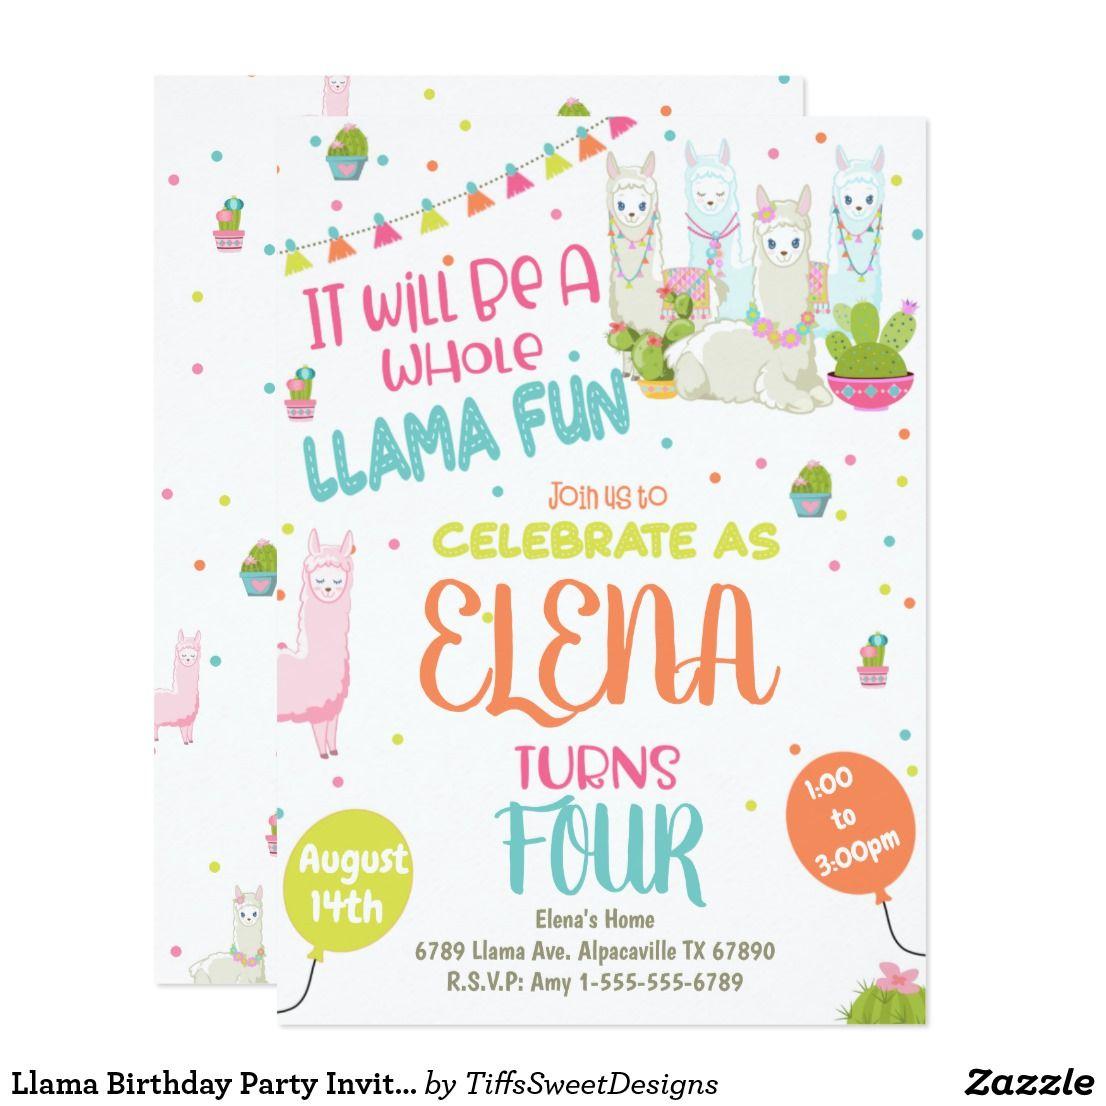 Llama Birthday Party Invitation Alpaca Party | Kids 2-12 Birthday ...